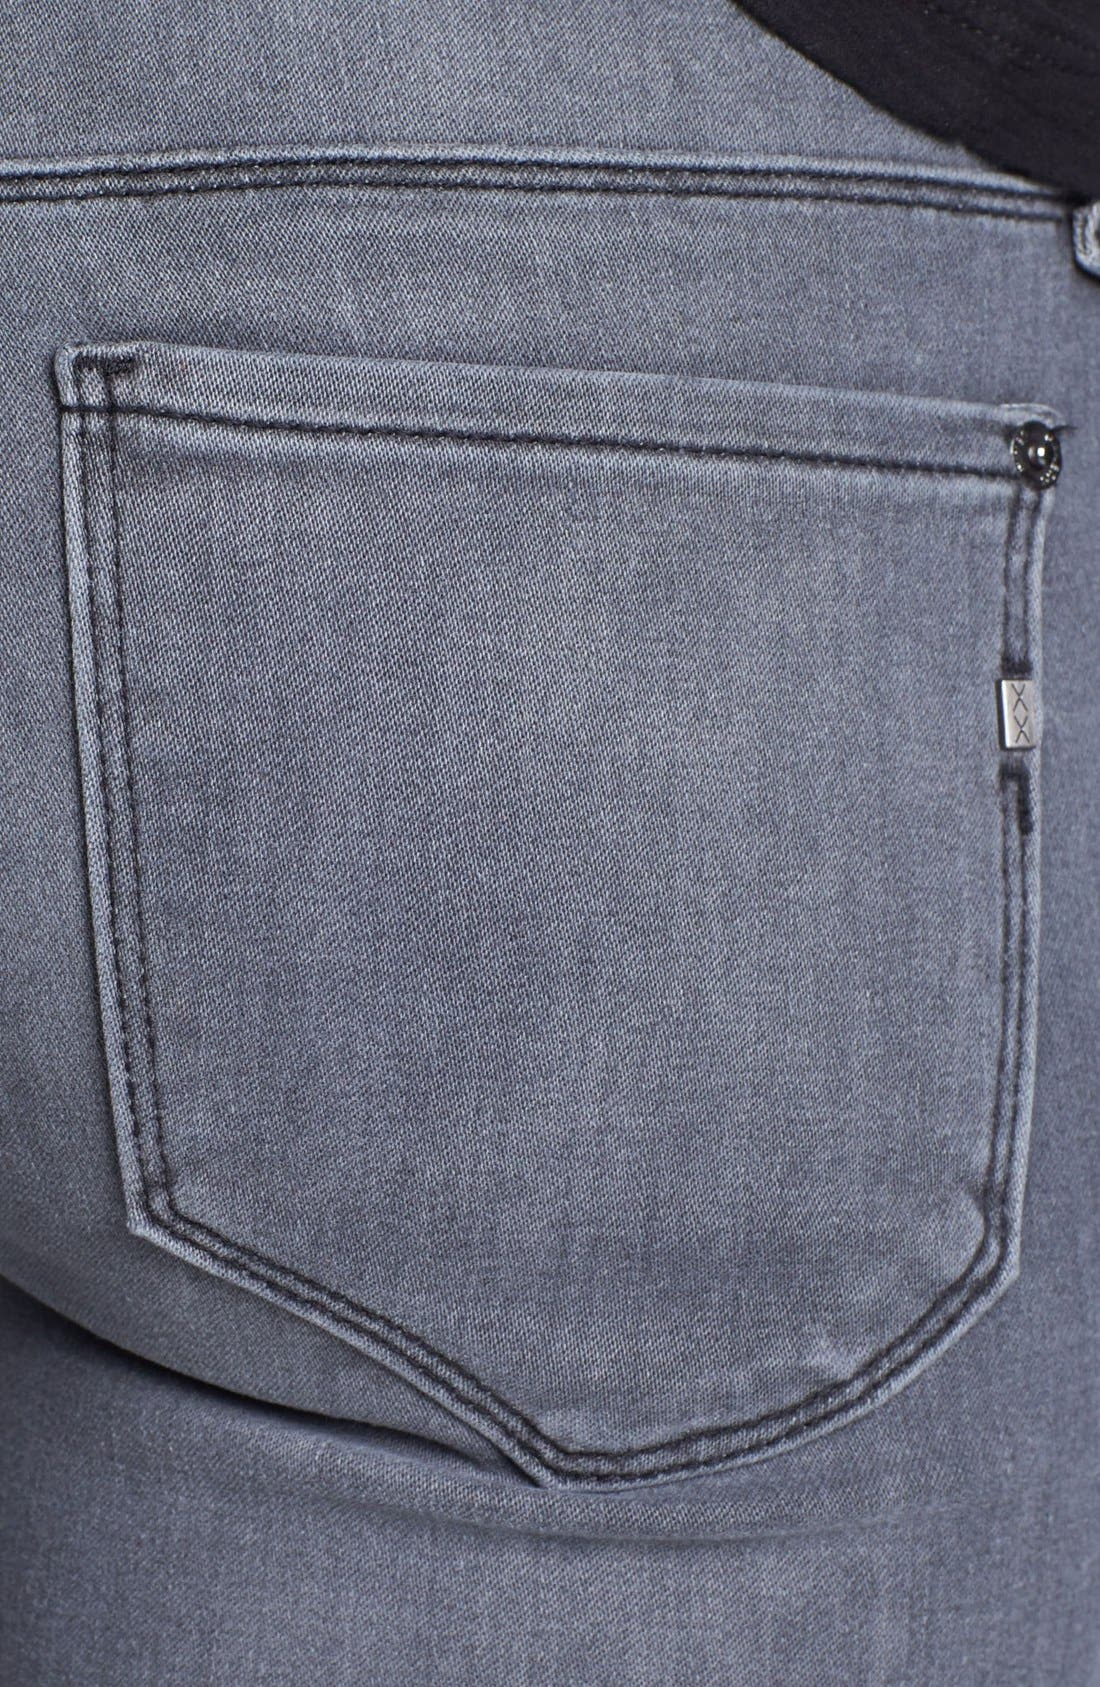 Alternate Image 3  - Genetic 'Shya' Cigarette Skinny Jeans (Gaze)